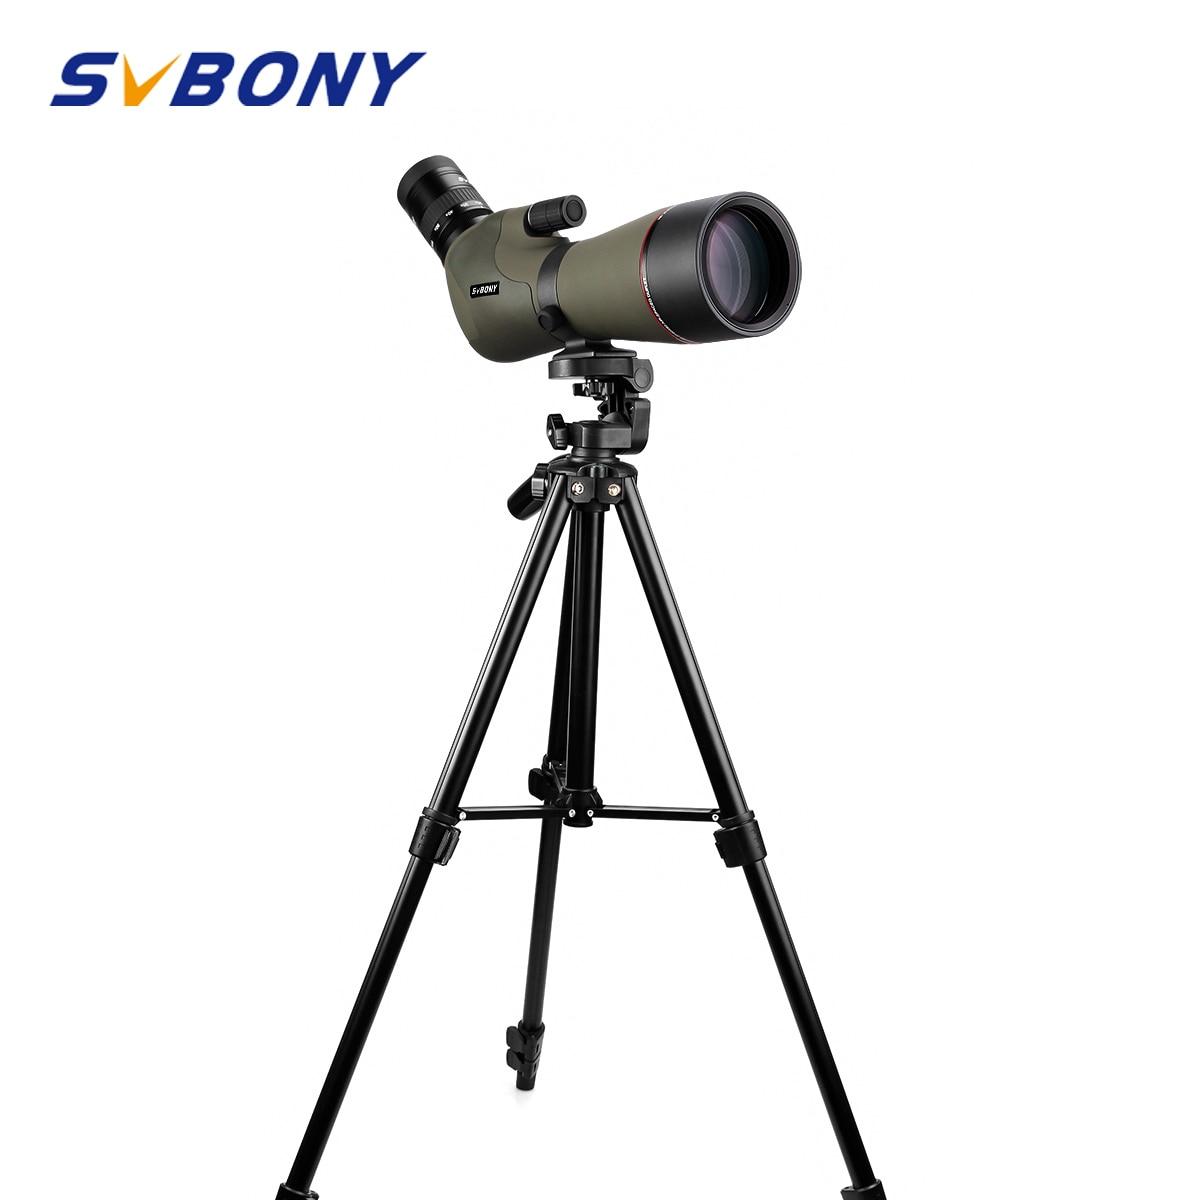 "SVBONY 20 60x80 Zoom Spotting Scope Nitrogen Filled Water proof Telescope Dual Focus Mechanism Metal Body w/ 54"" Aluminum Tripod-in Spotting Scopes from Sports & Entertainment"